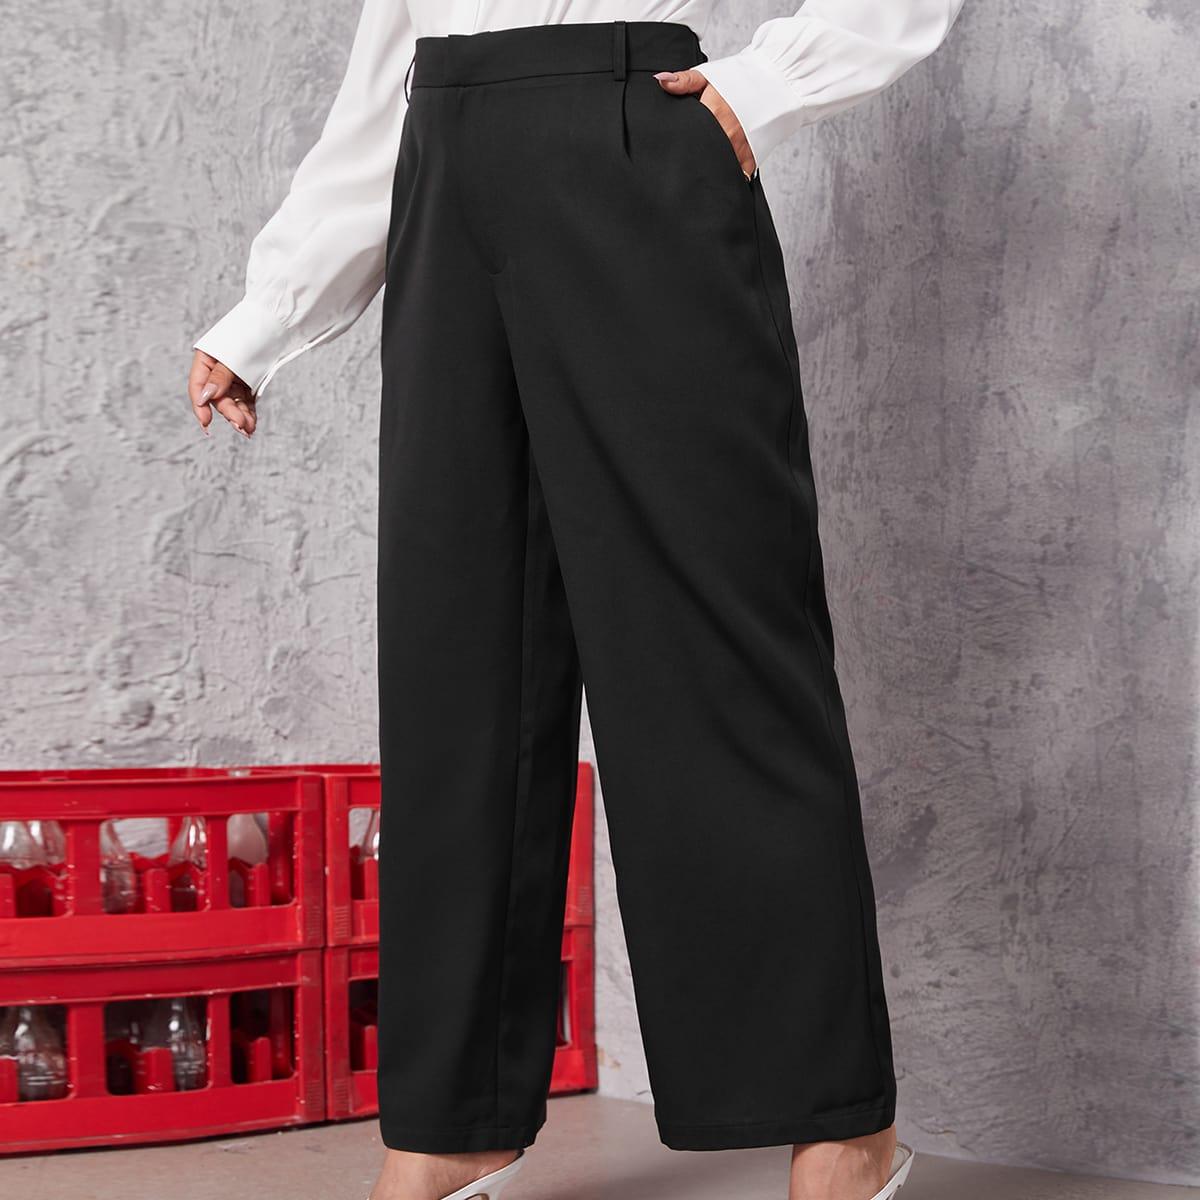 Plus High Waist Wide Leg Tailored Pants